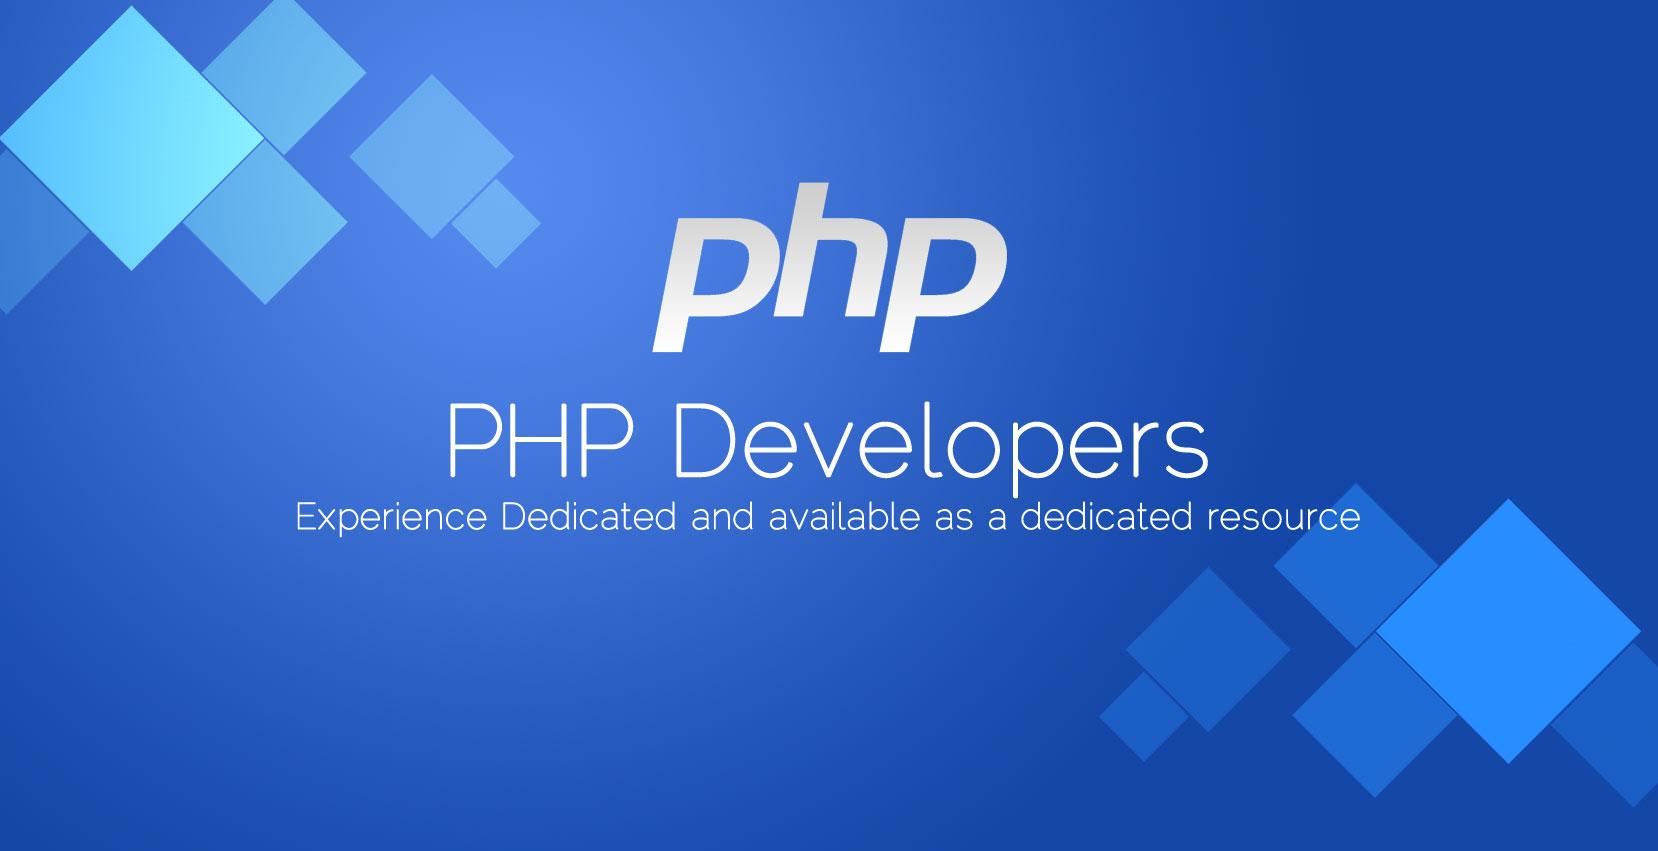 Hiring of dedicated PHP